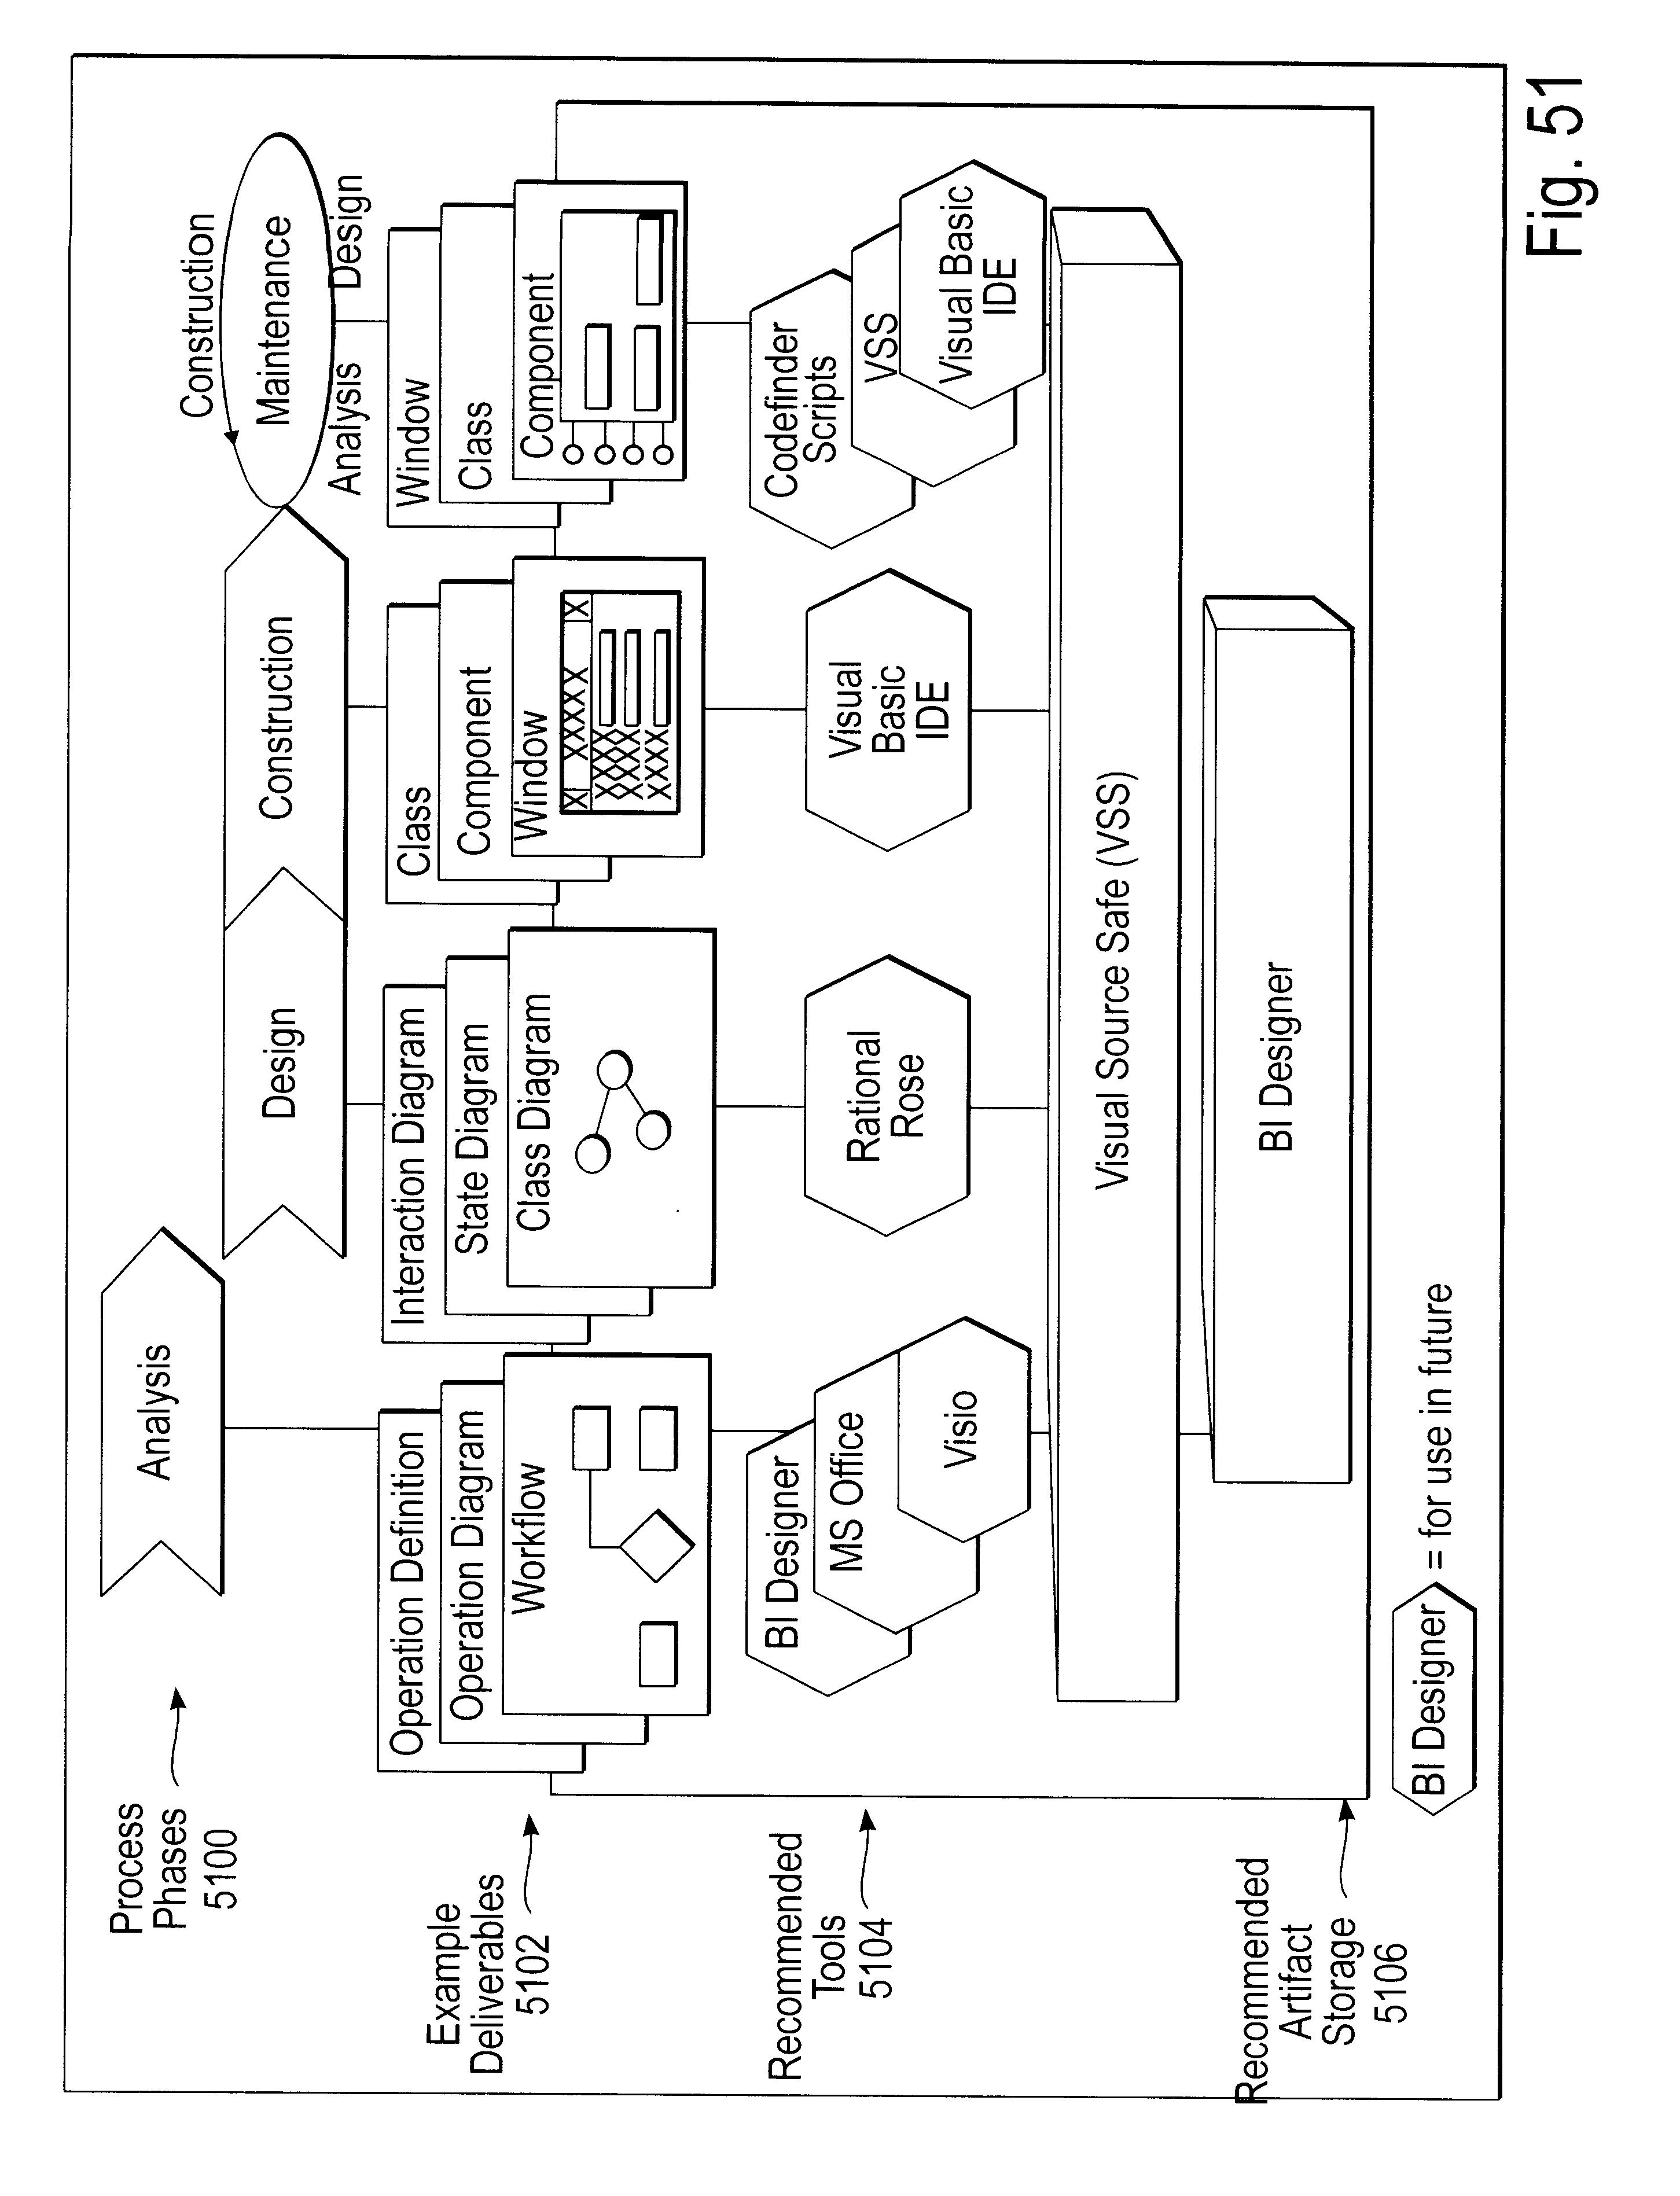 Patent Us 6332163 B1 Mac Valve Wiring Diagram 6500 Images